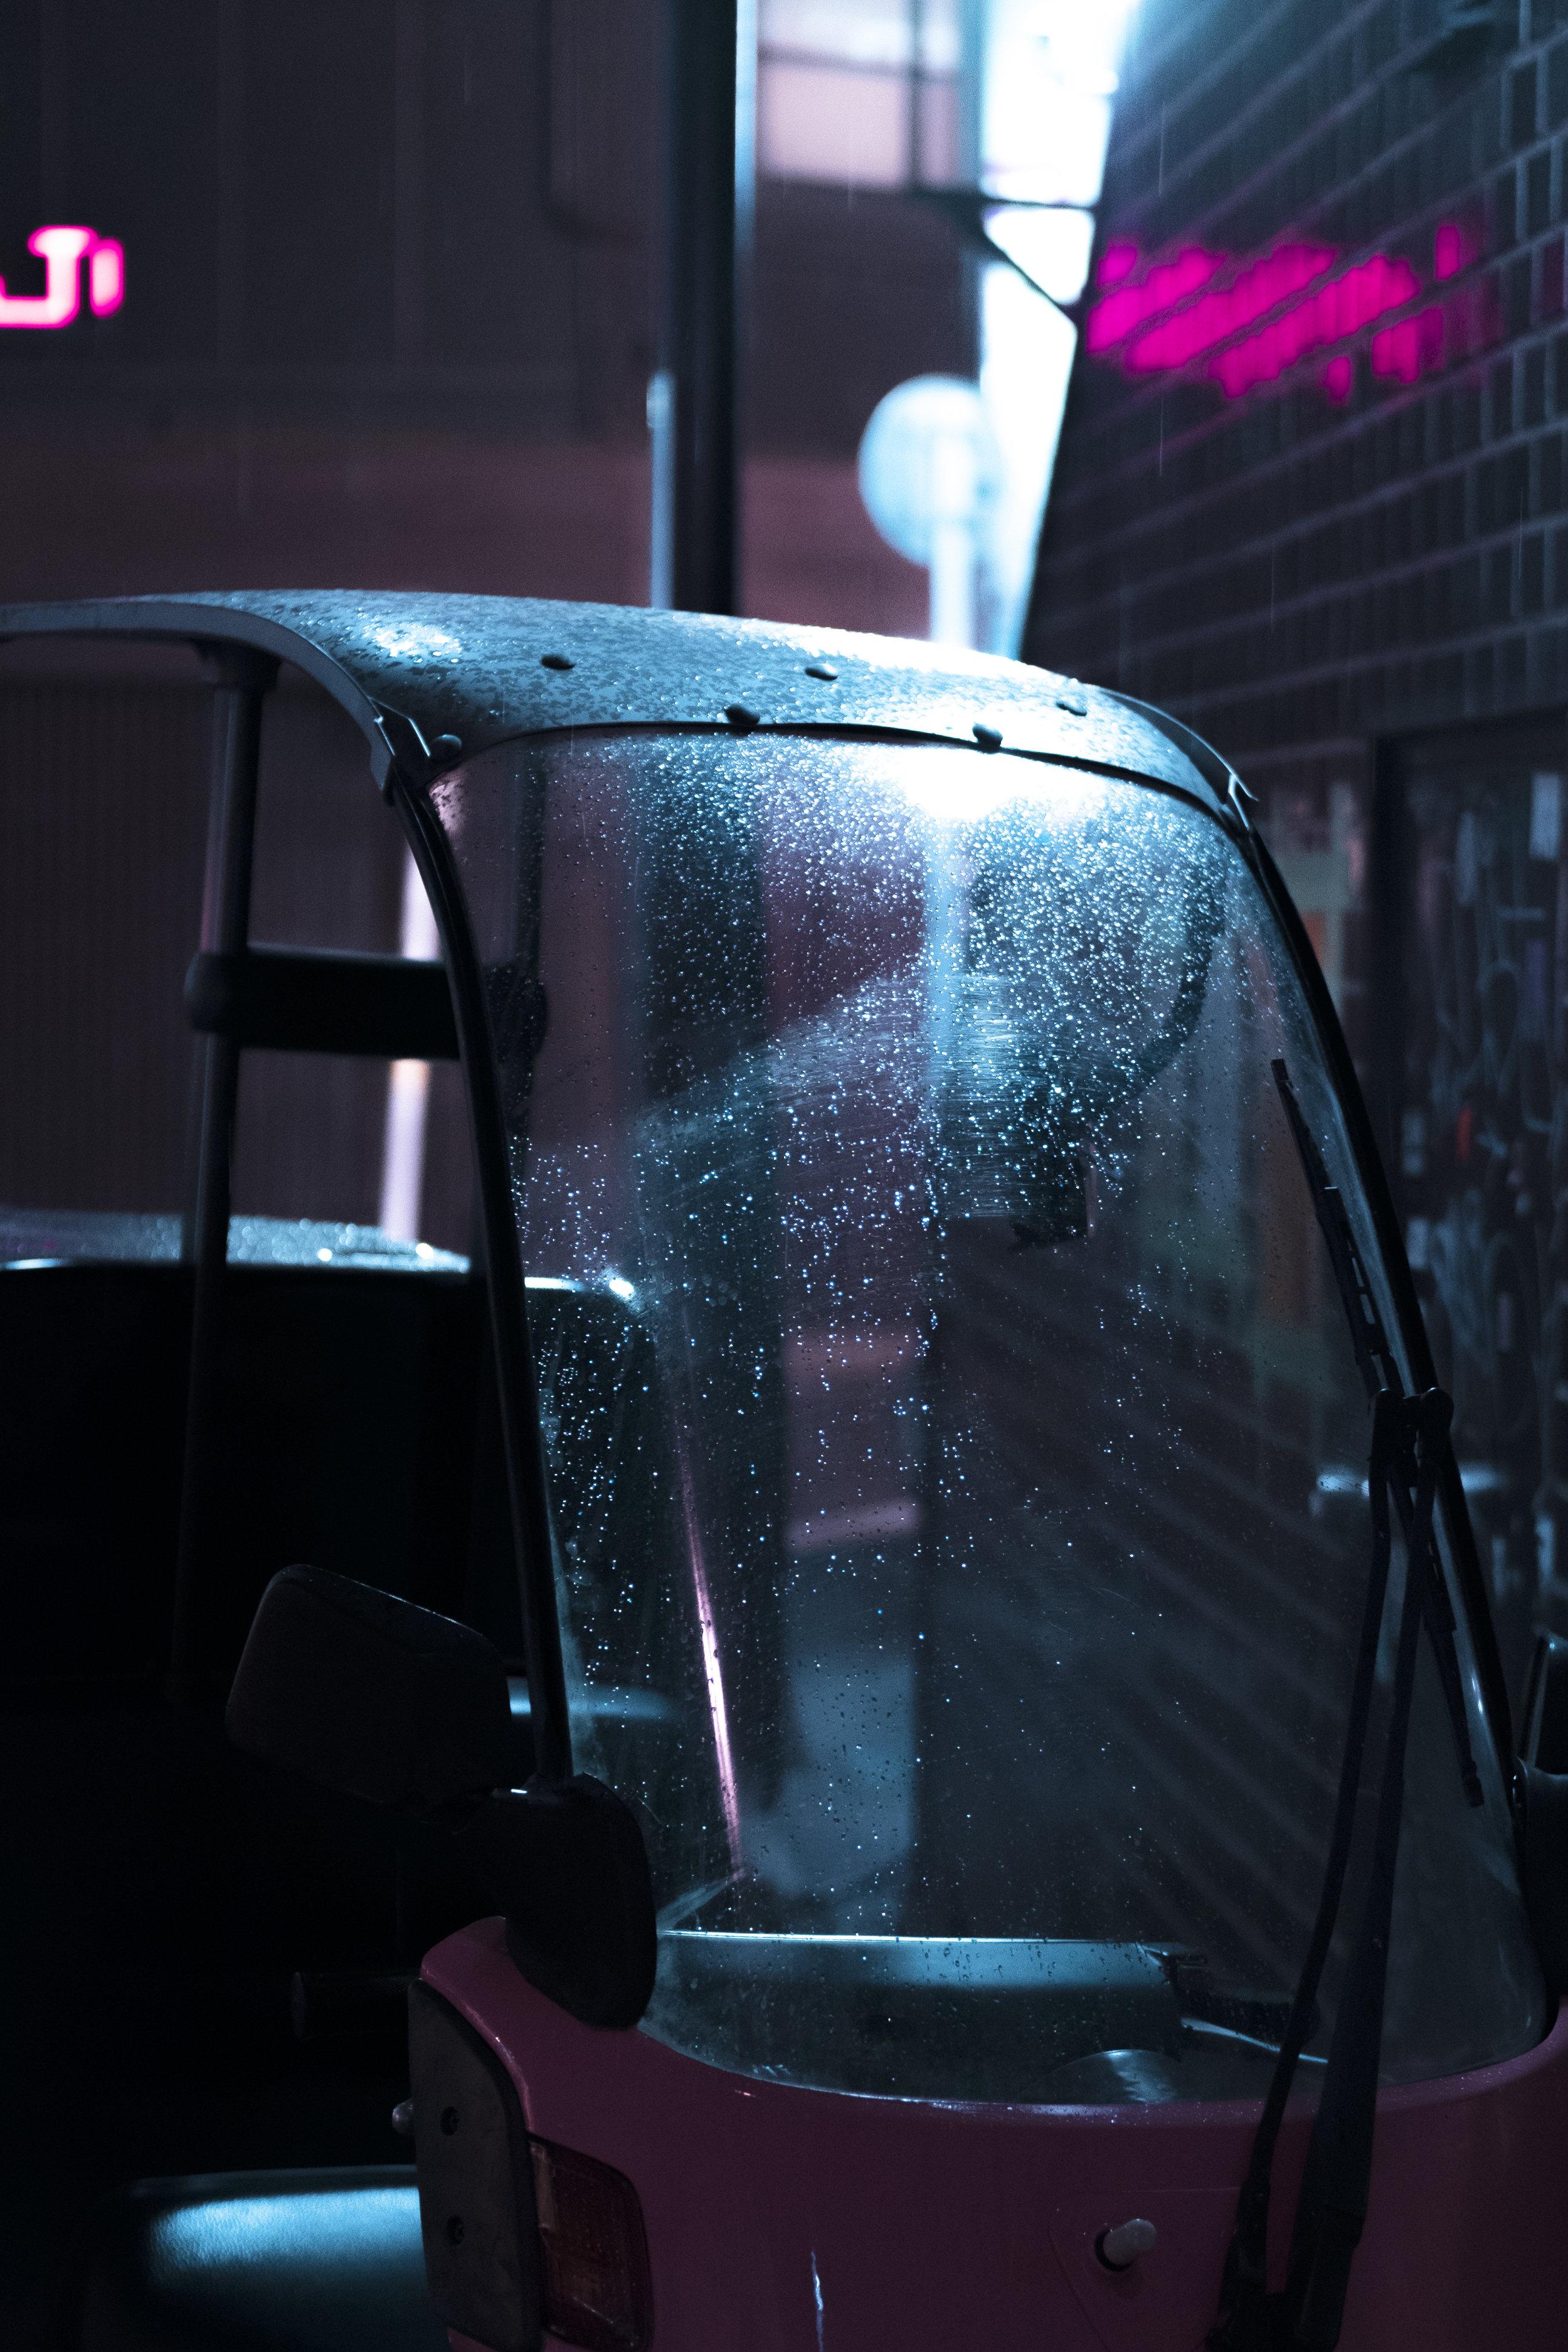 buggy rain.jpg